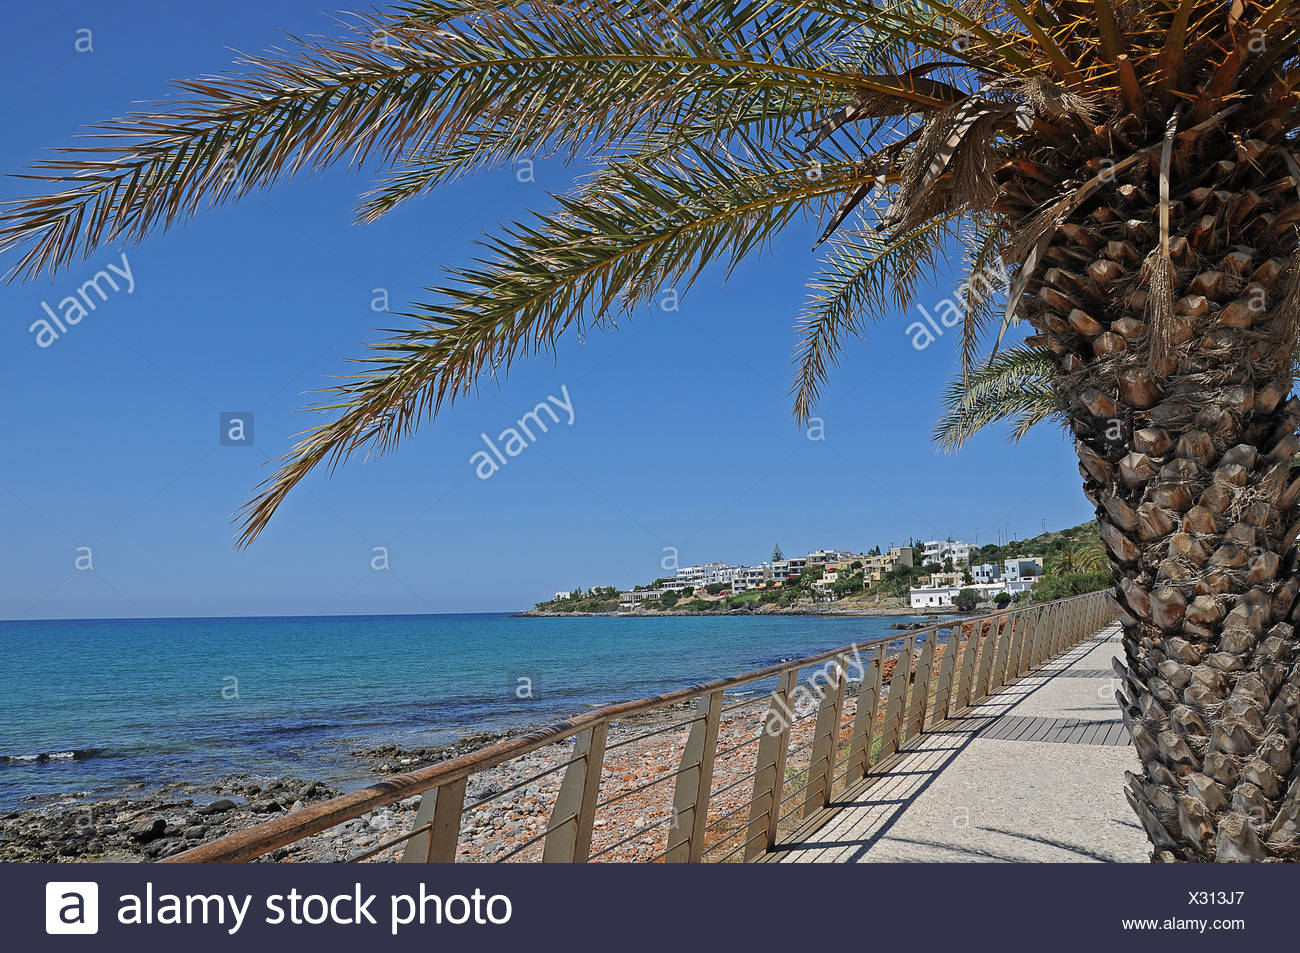 Palm tree, promenade, Malia, Crete, Greece, Europe - Stock Image